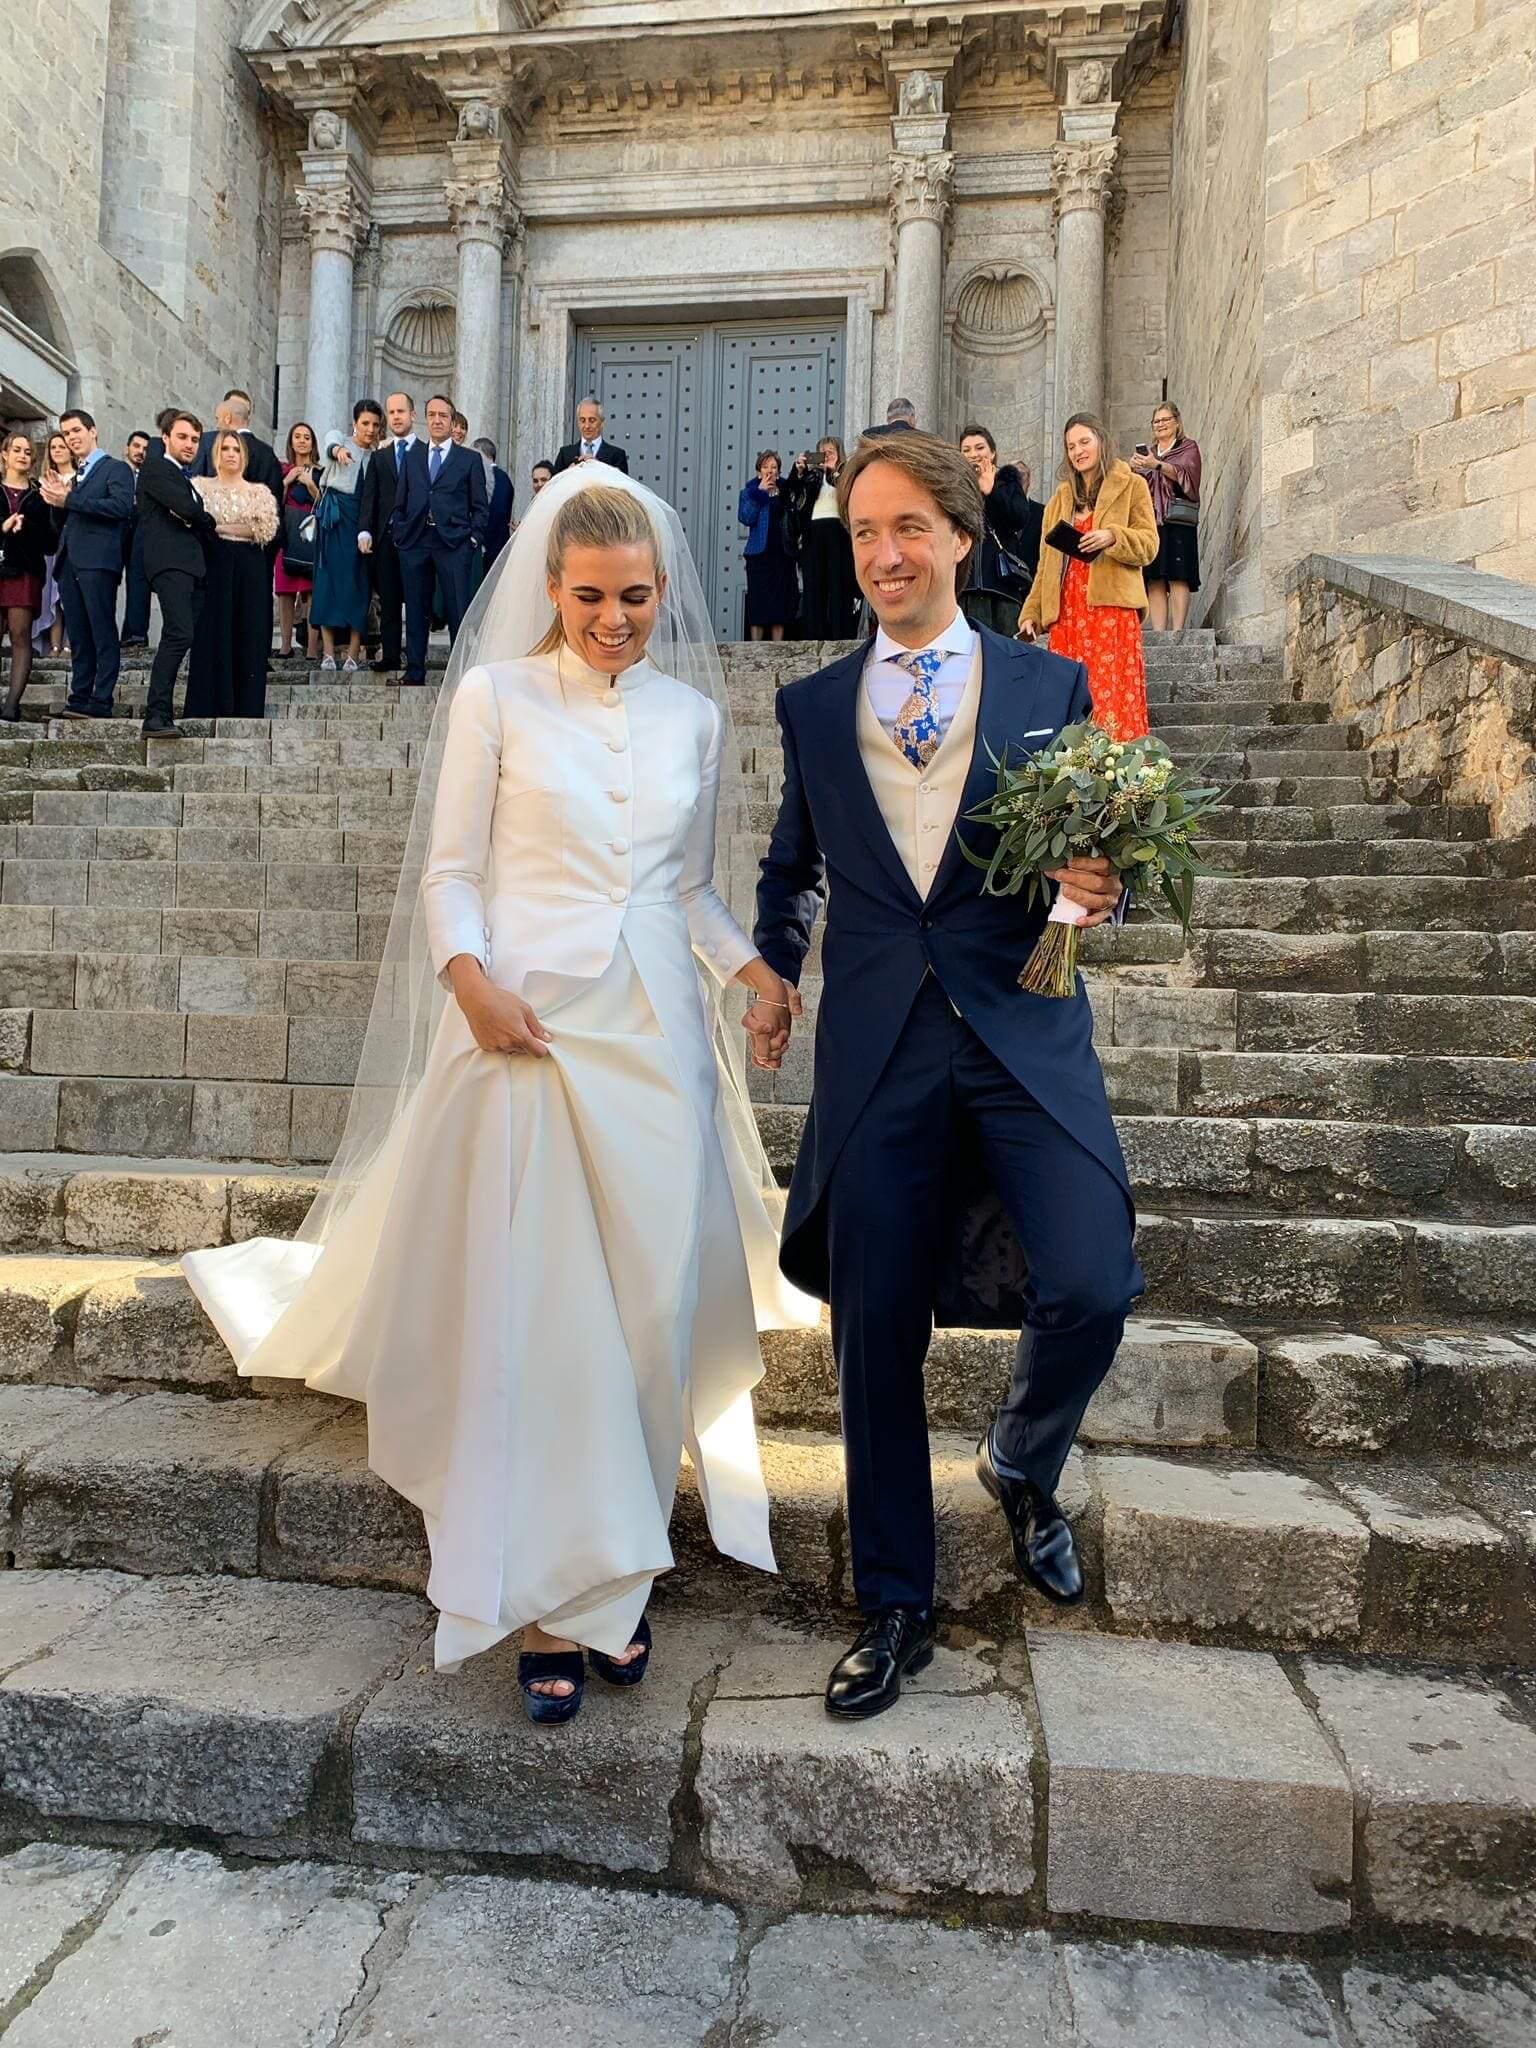 tot-hom wedding dress